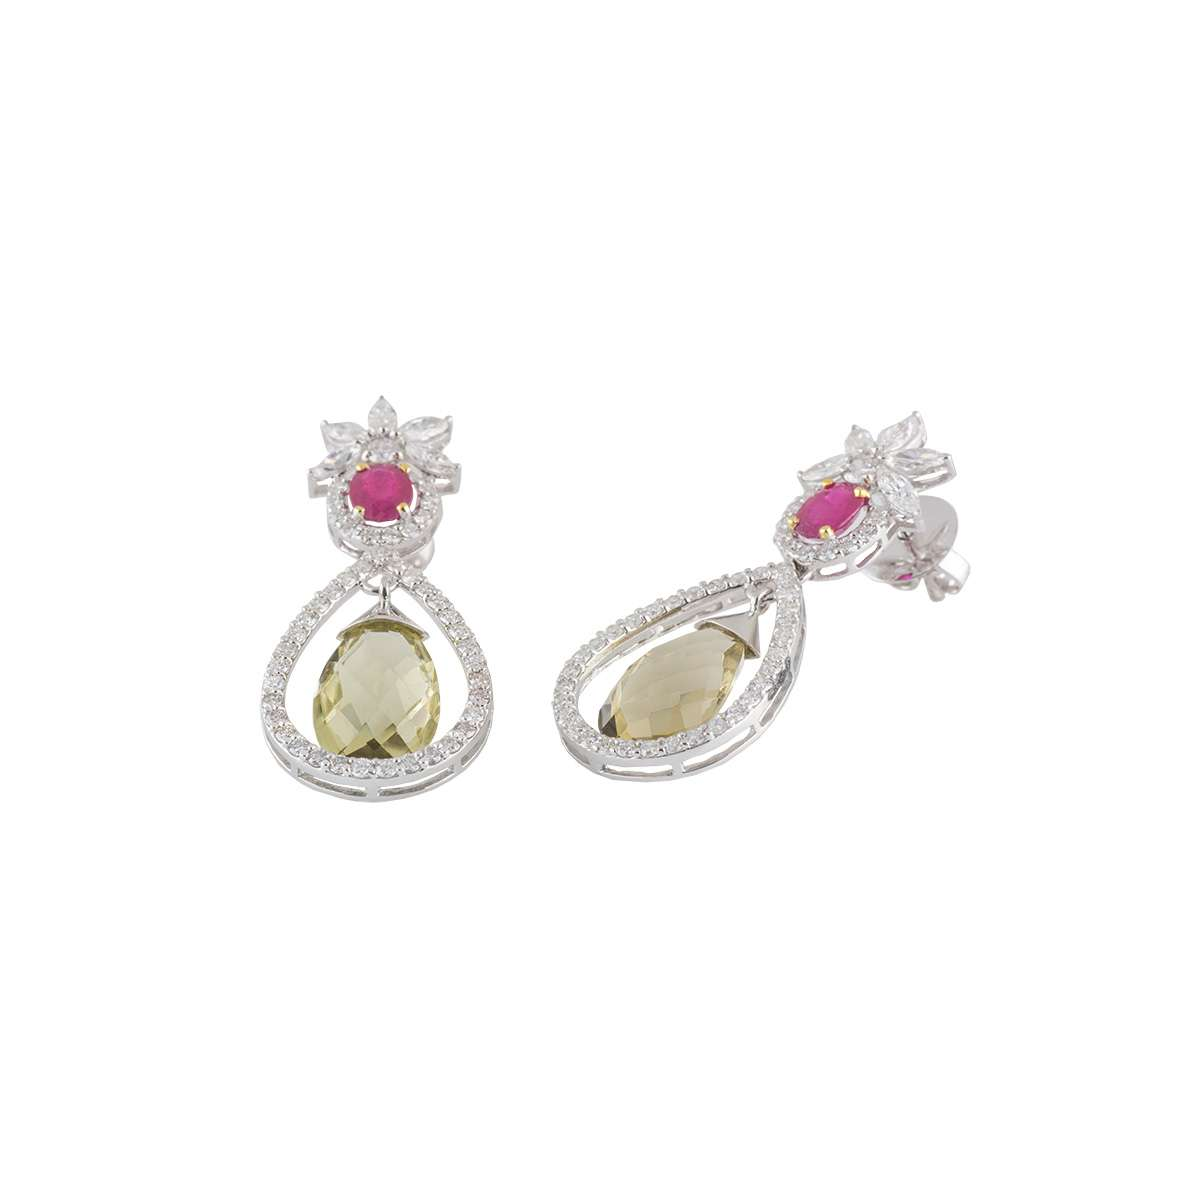 14k White Gold Diamond and Multi-Gemstone Drop Earrings